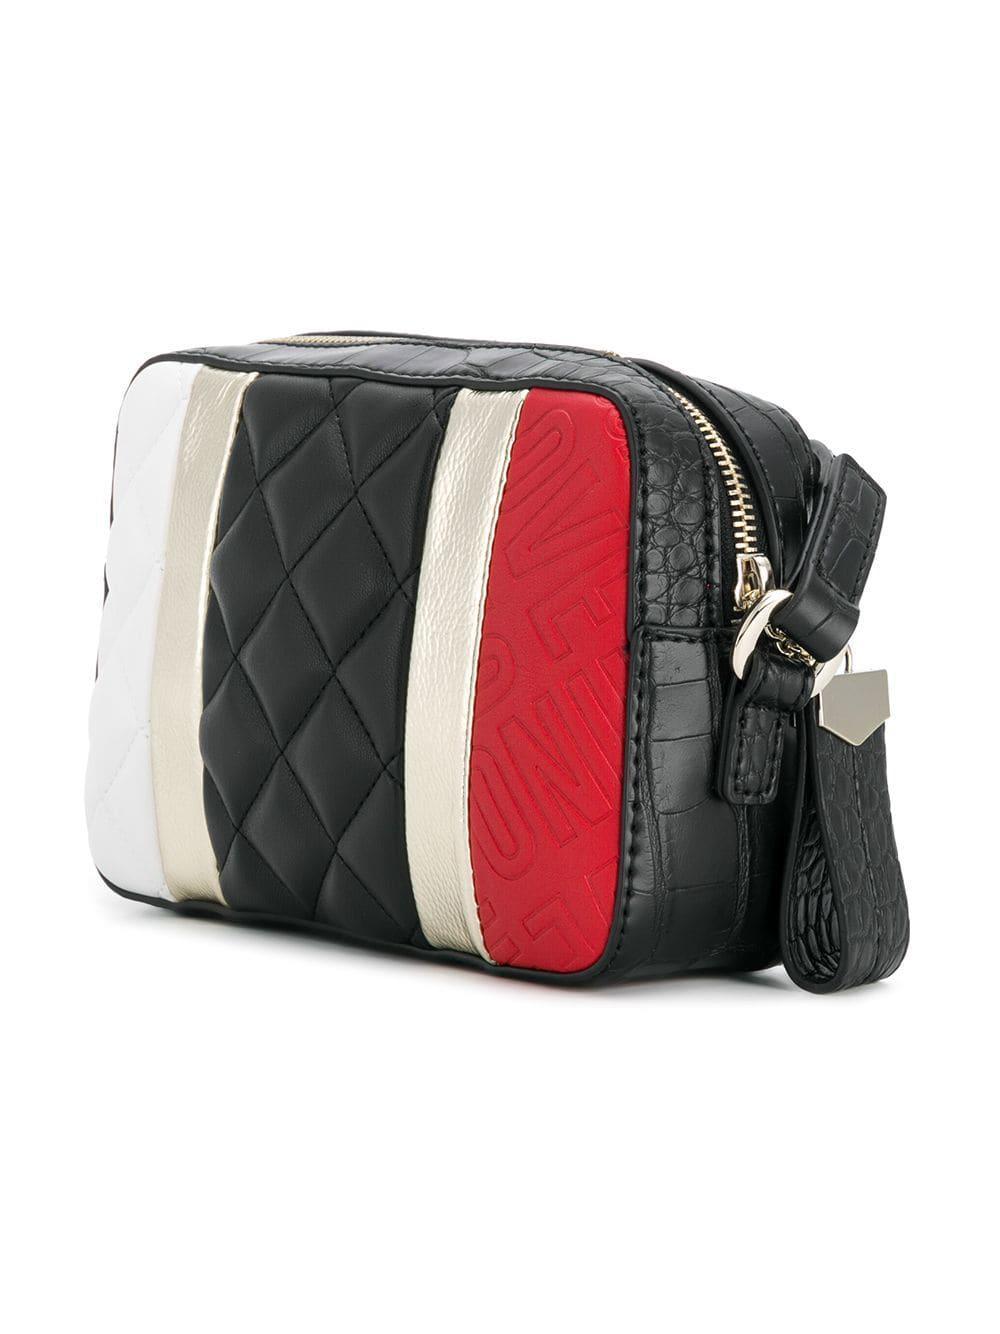 a26111ea94a Lyst - Love Moschino Borsa Sling Bag in Black